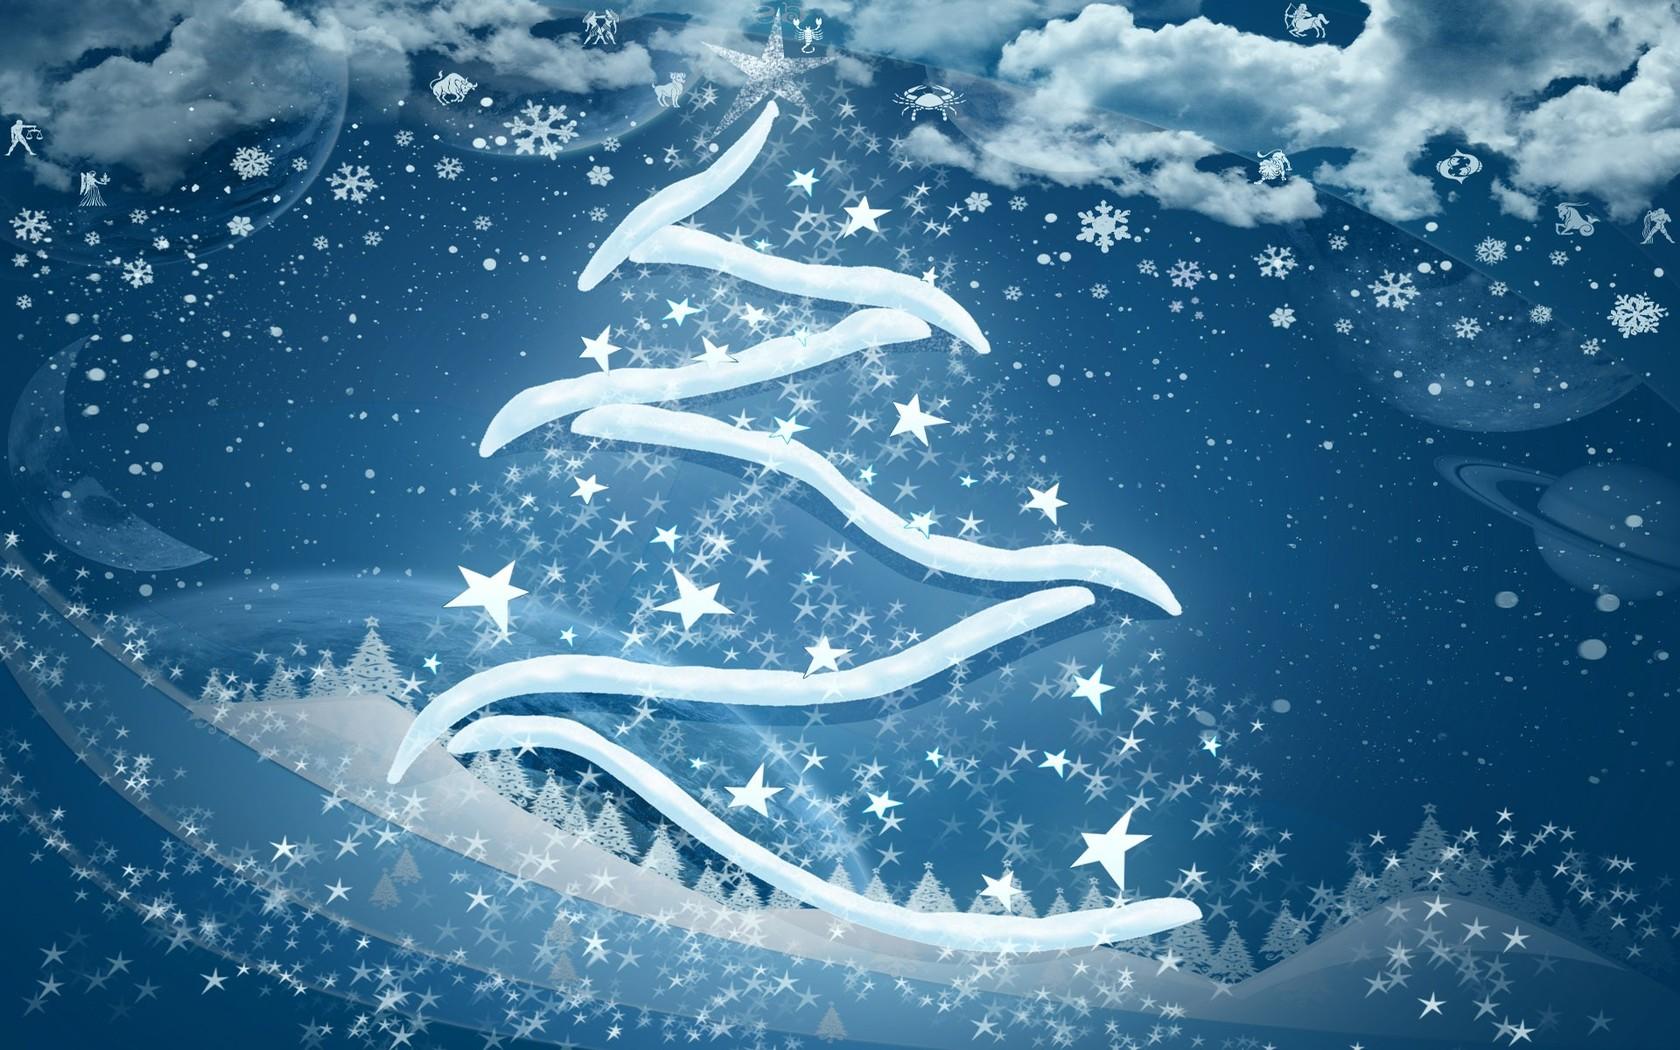 Snowy Christmas tree wallpaper 5761 1680x1050